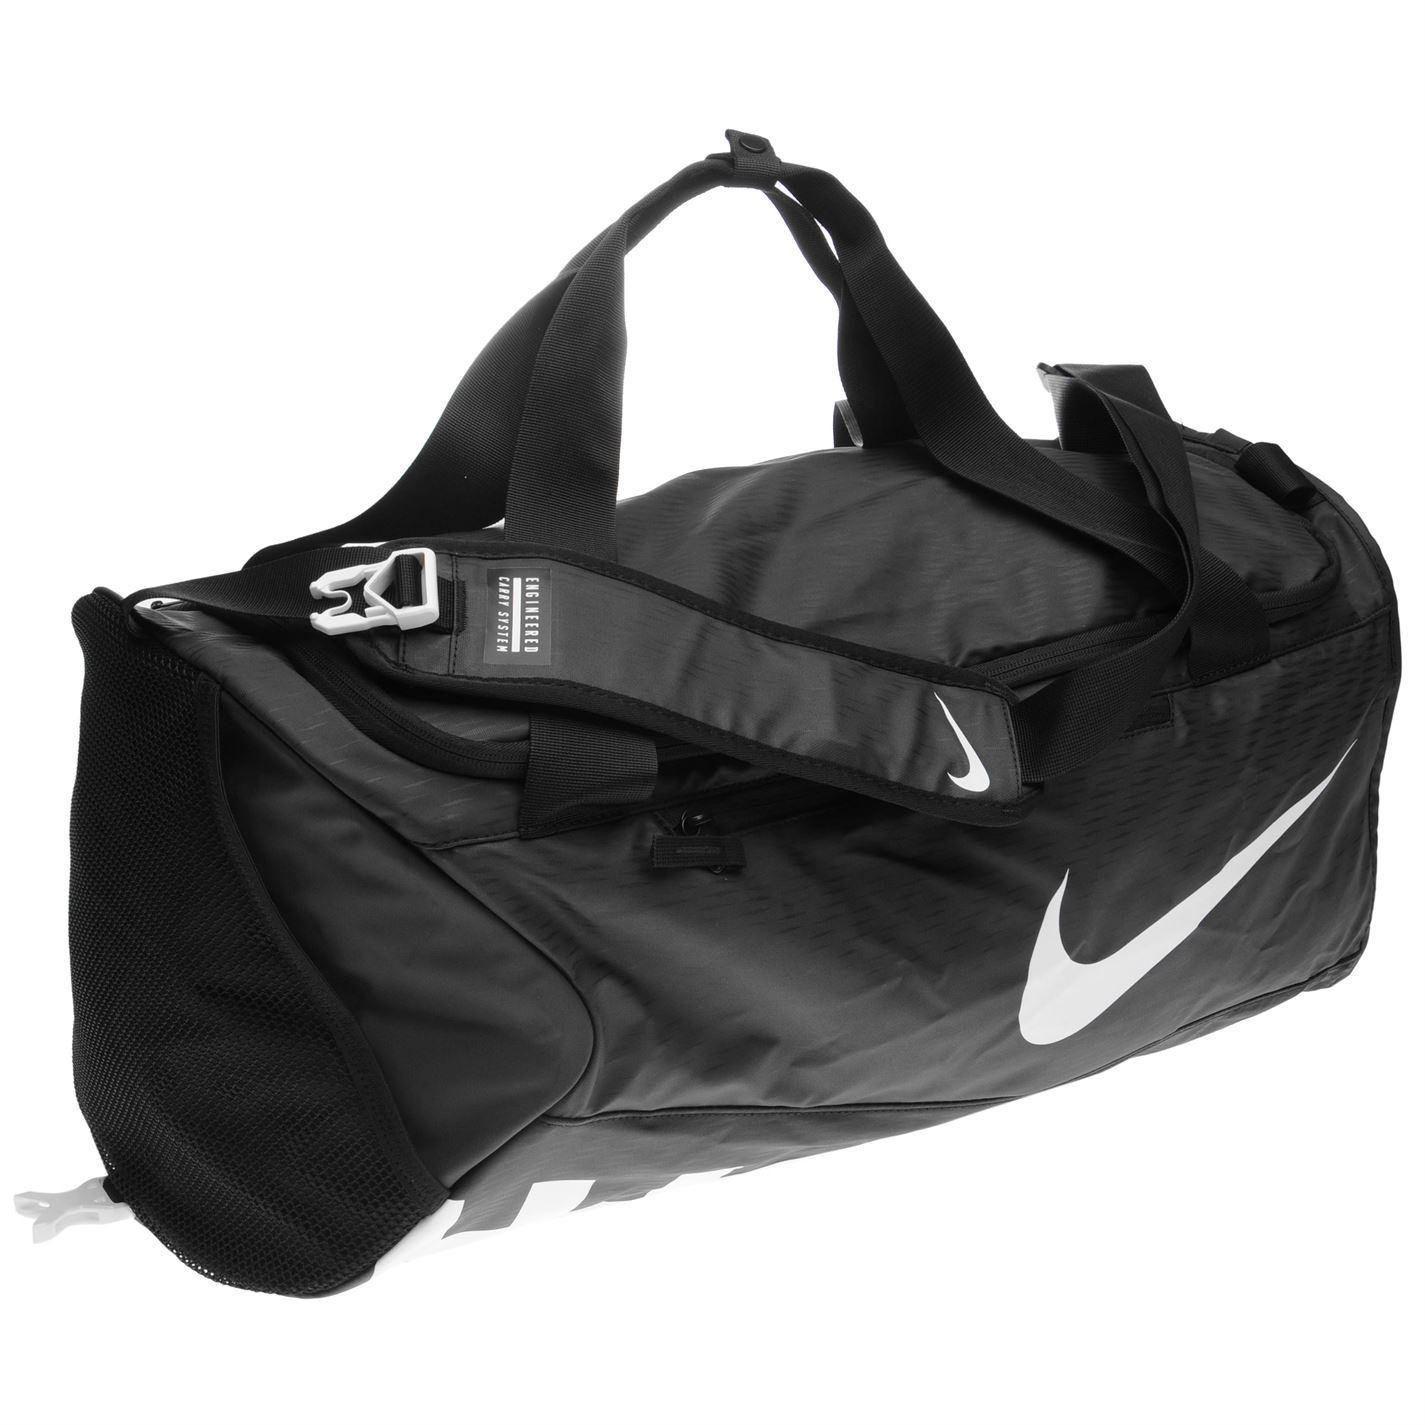 ... Nike Alpha Small Duffel Bag Black White Sports Gym Bag Holdall Carryall  ... fc78fe8d92453